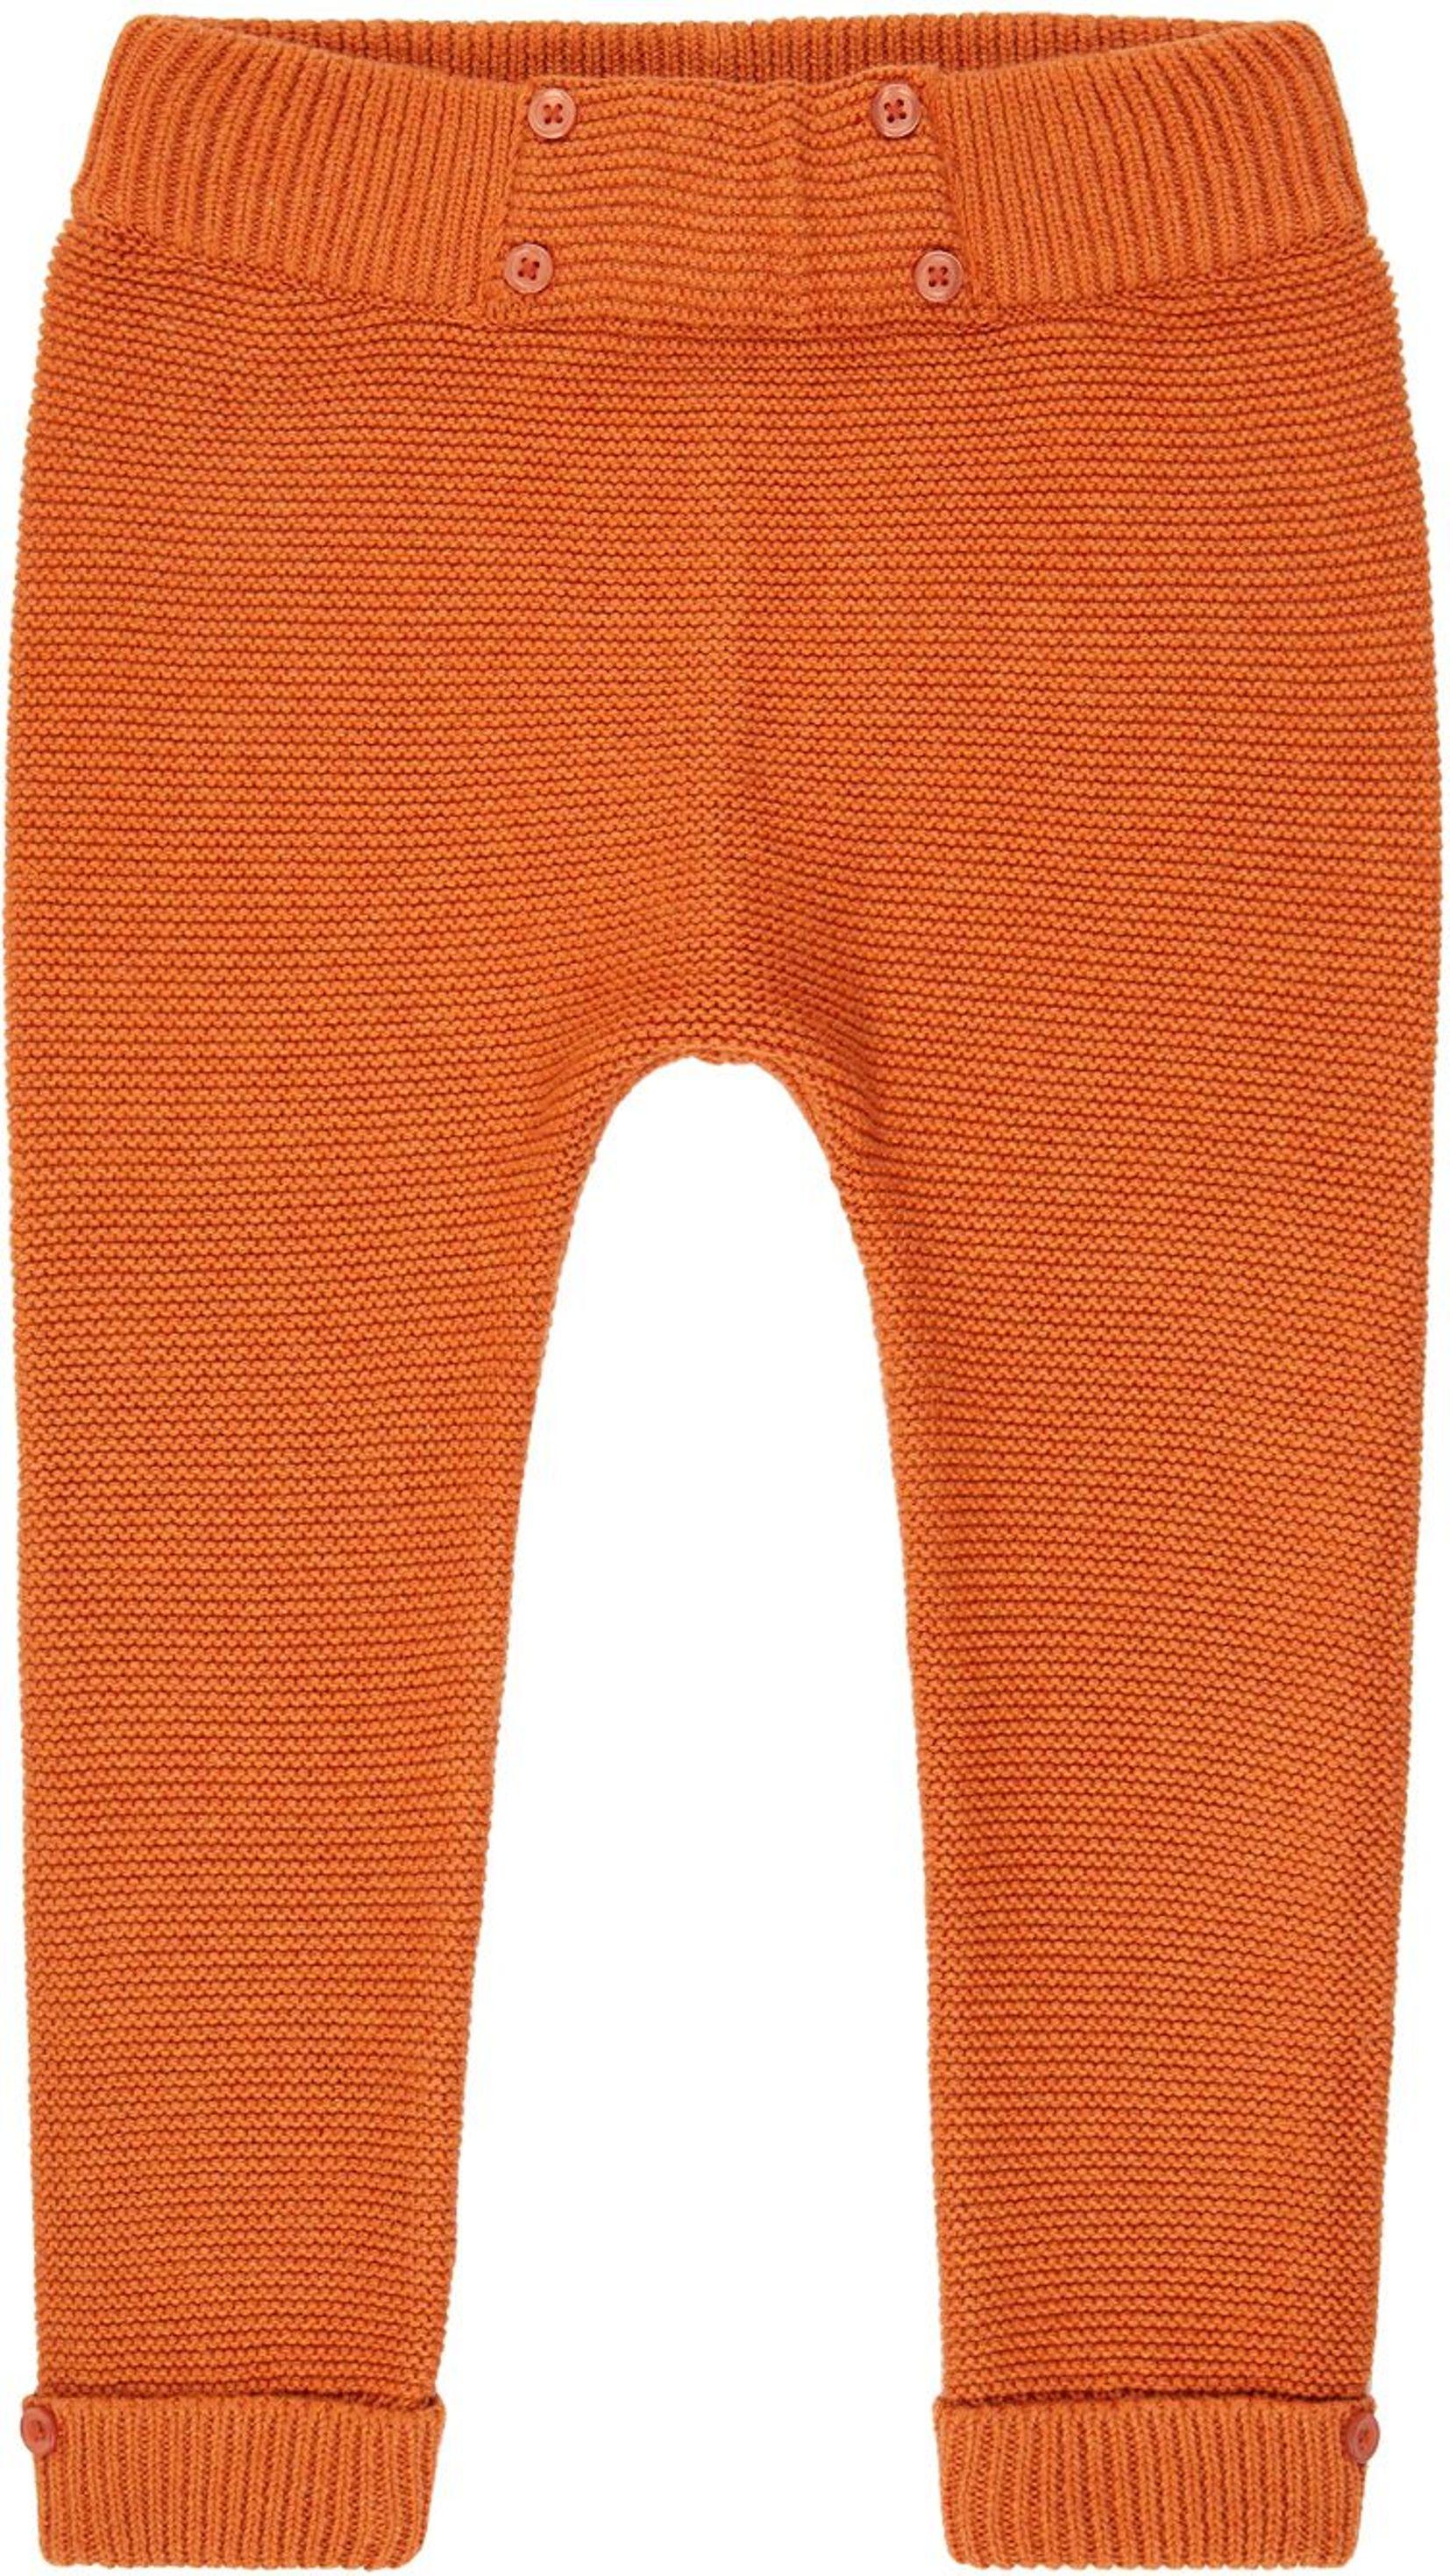 Sense Organic PROUST Baby Knitted Hose rusty orange